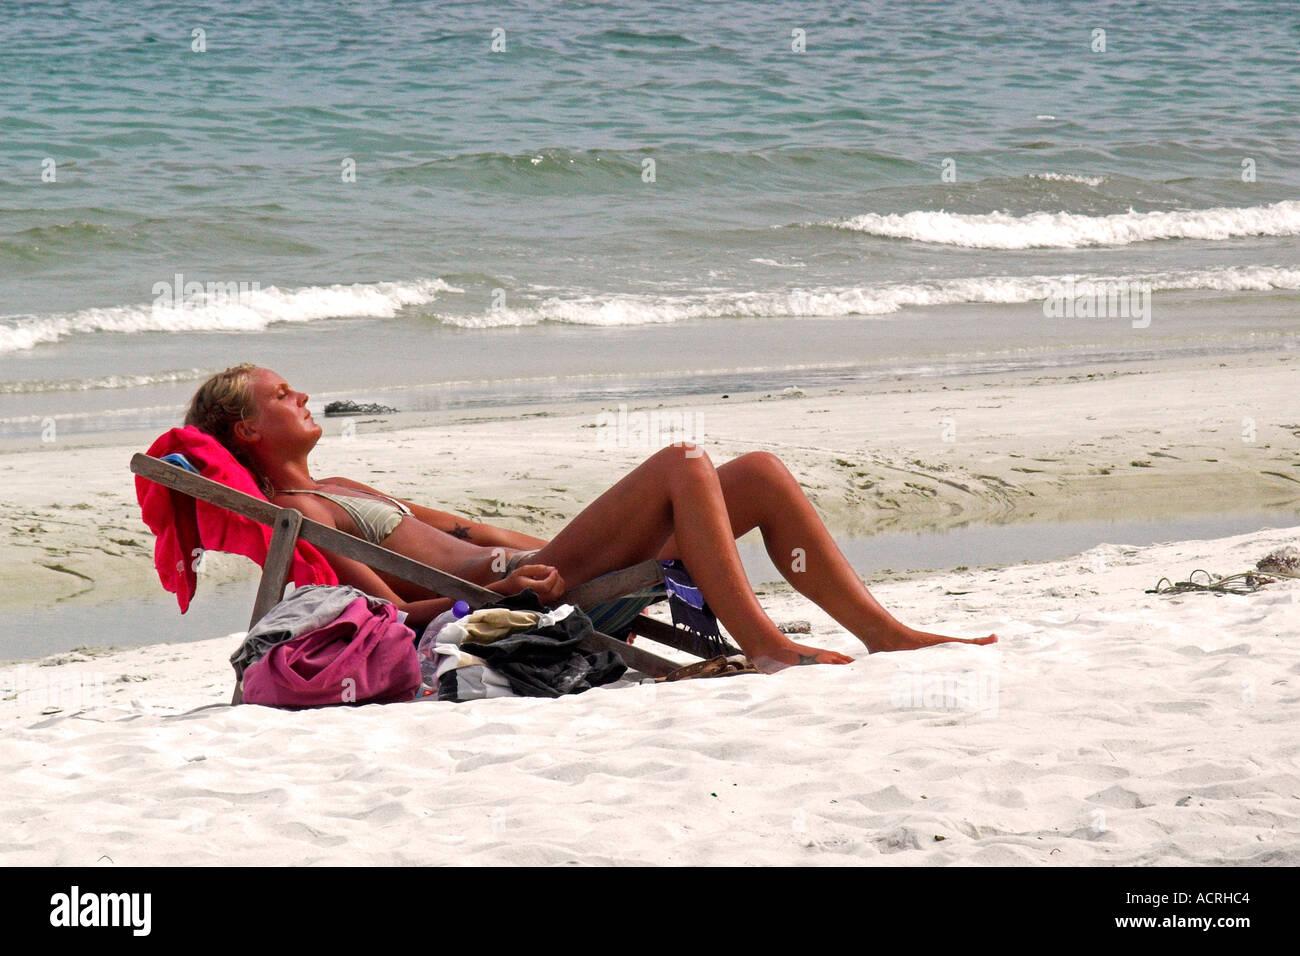 Young woman in bikini sunbathes in deckchair Ko Samet Thailand - Stock Image